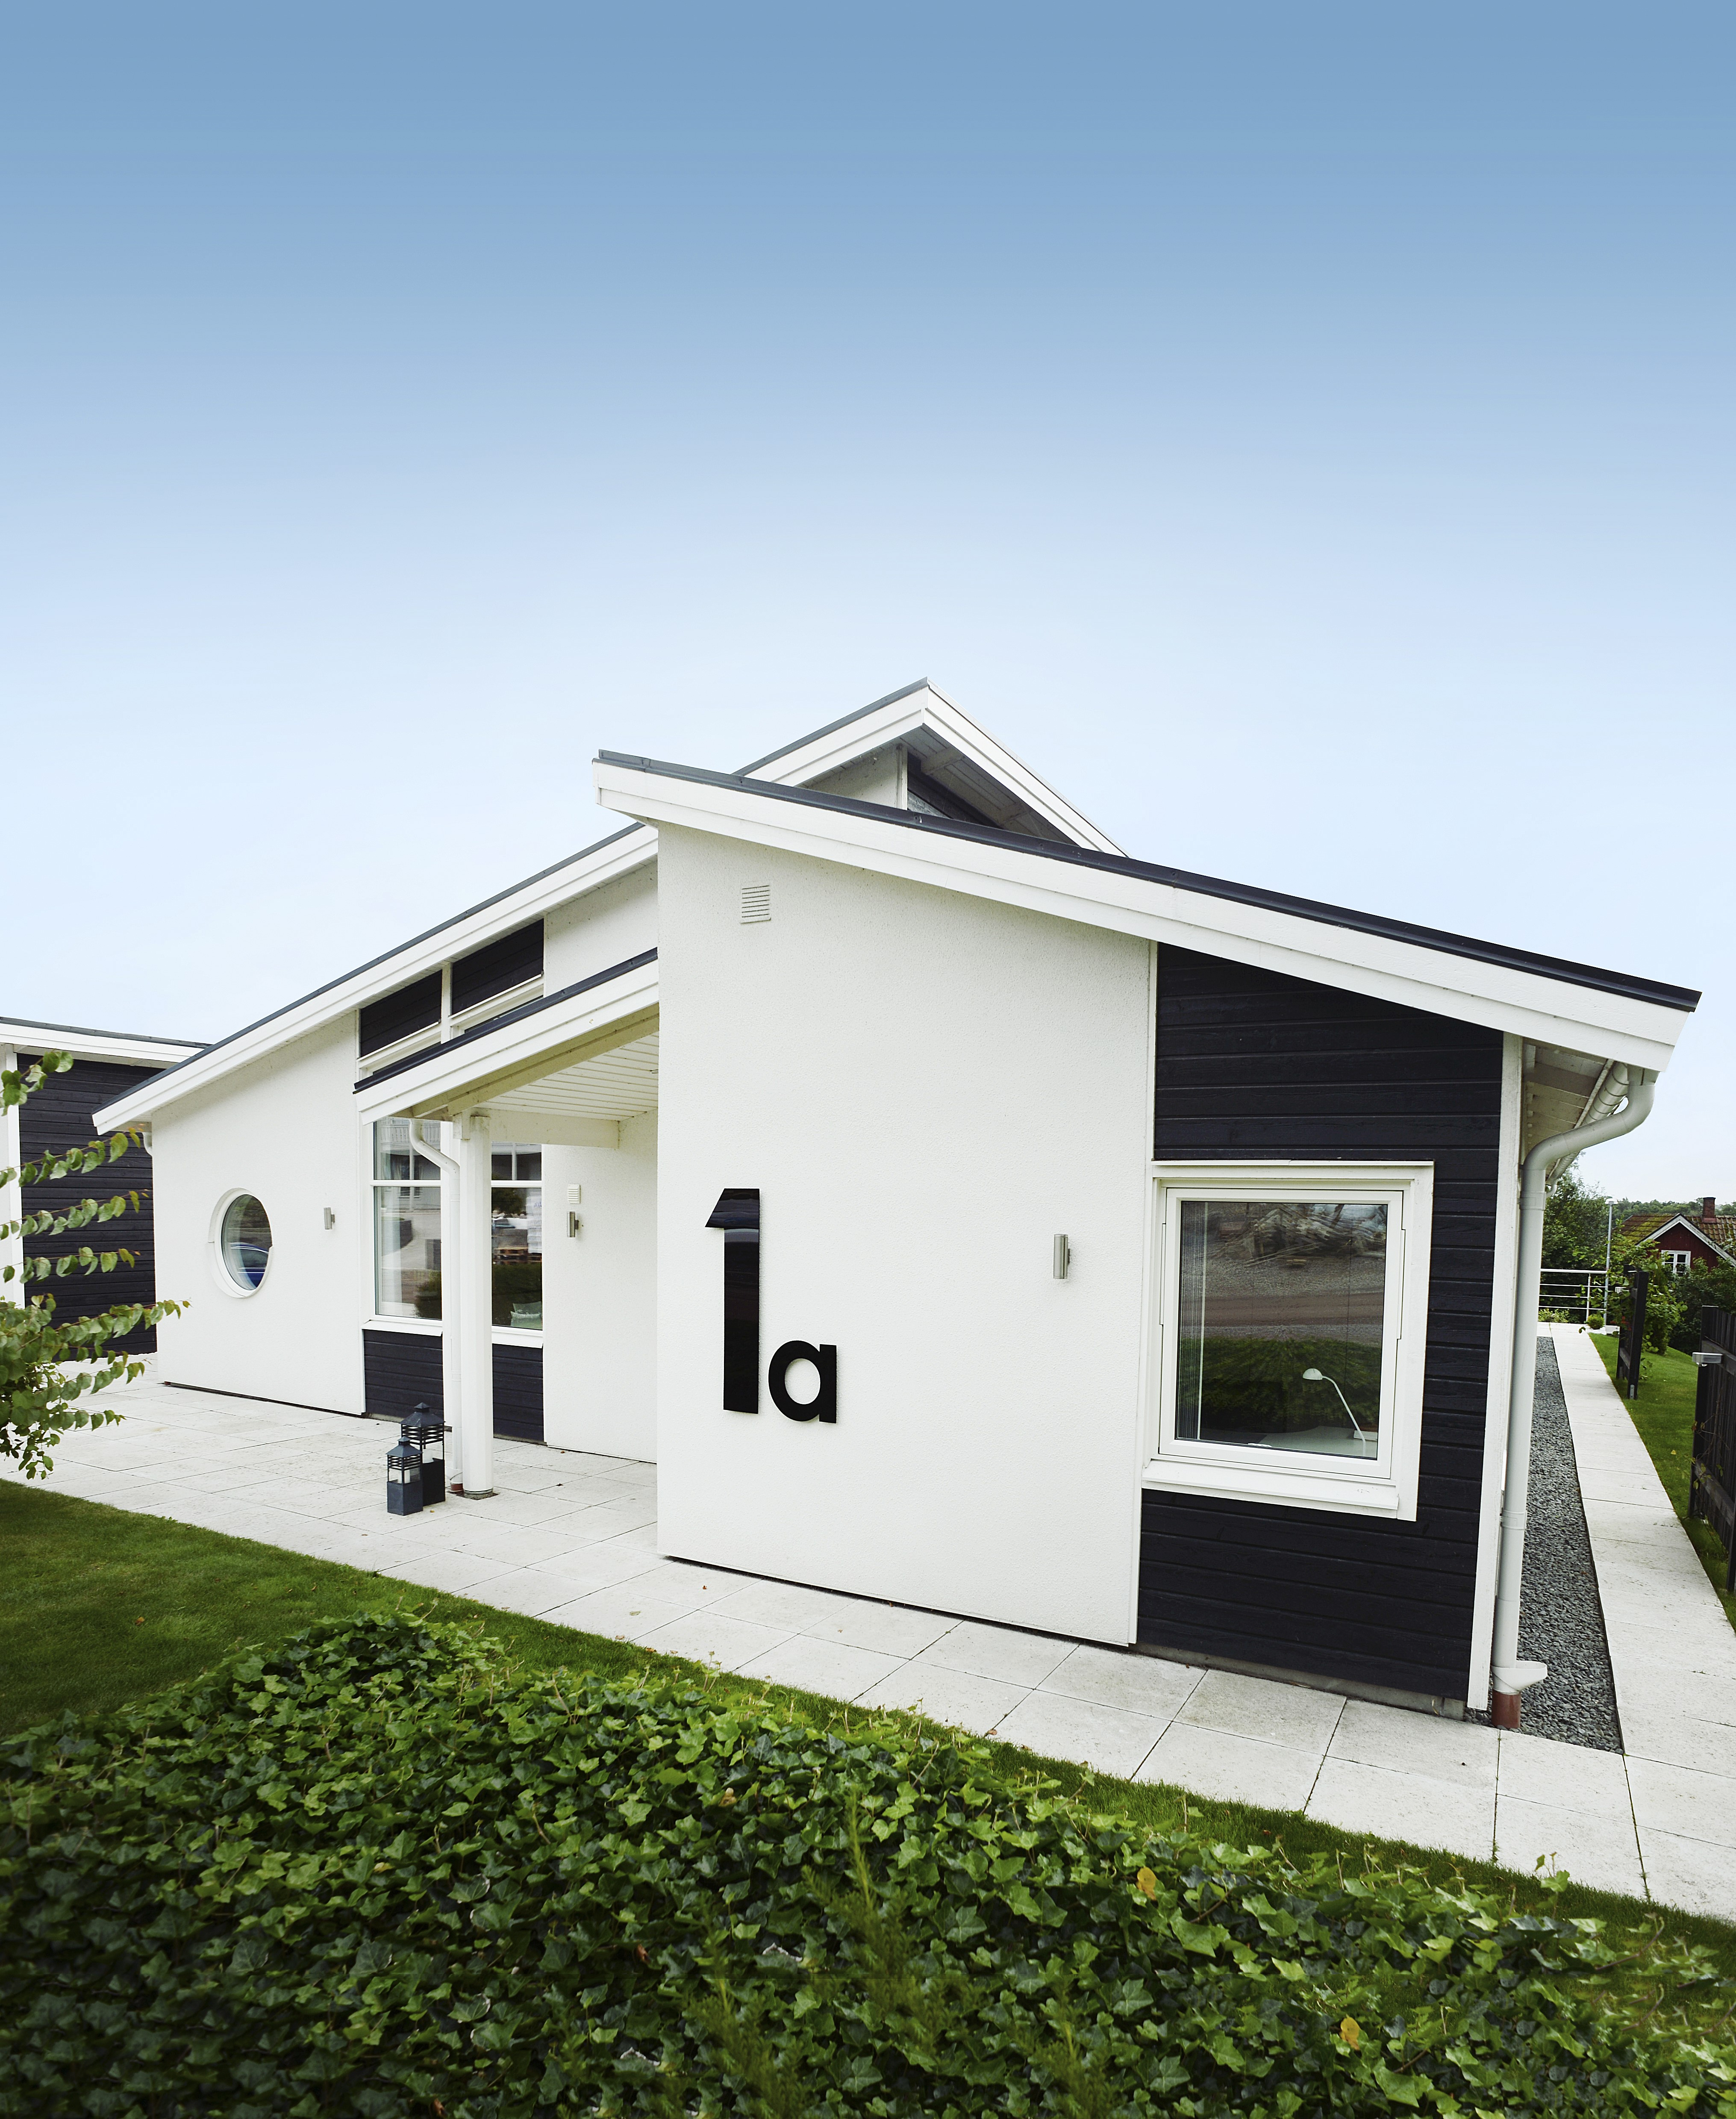 stående eller liggande panel utomhus